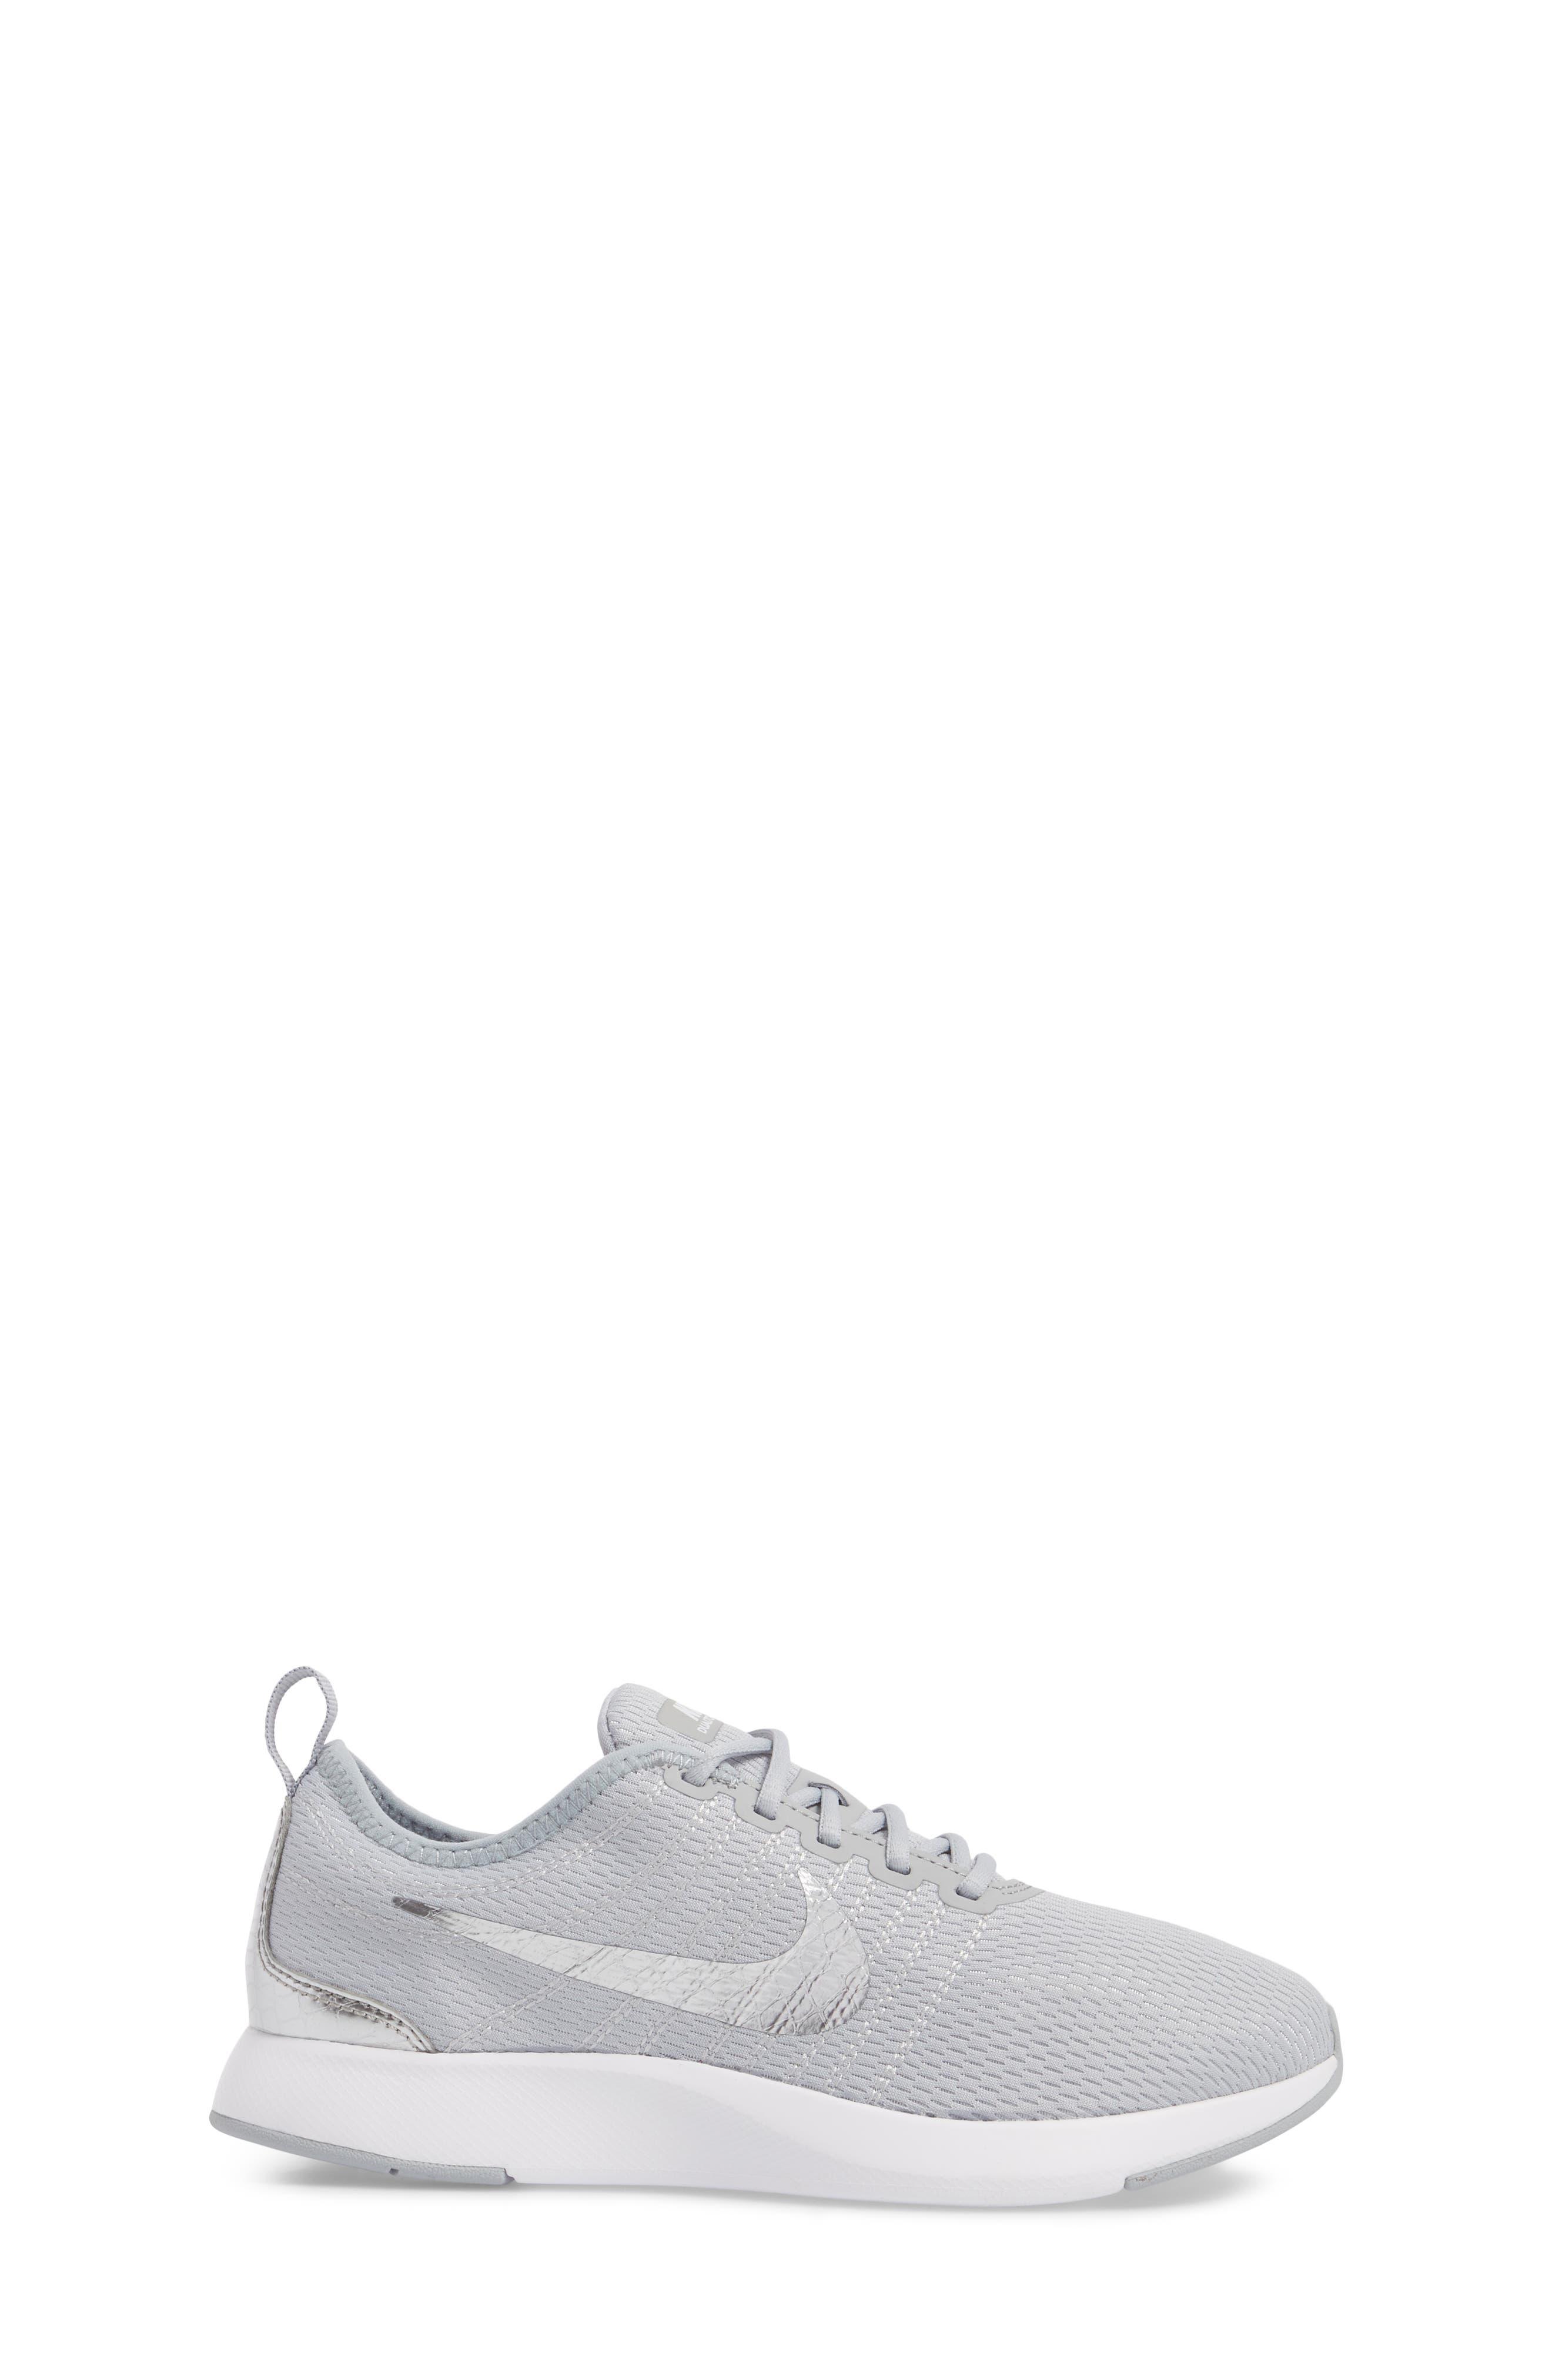 Dualtone Racer GS Sneaker,                             Alternate thumbnail 3, color,                             Wolf Grey/ Metallic Silver